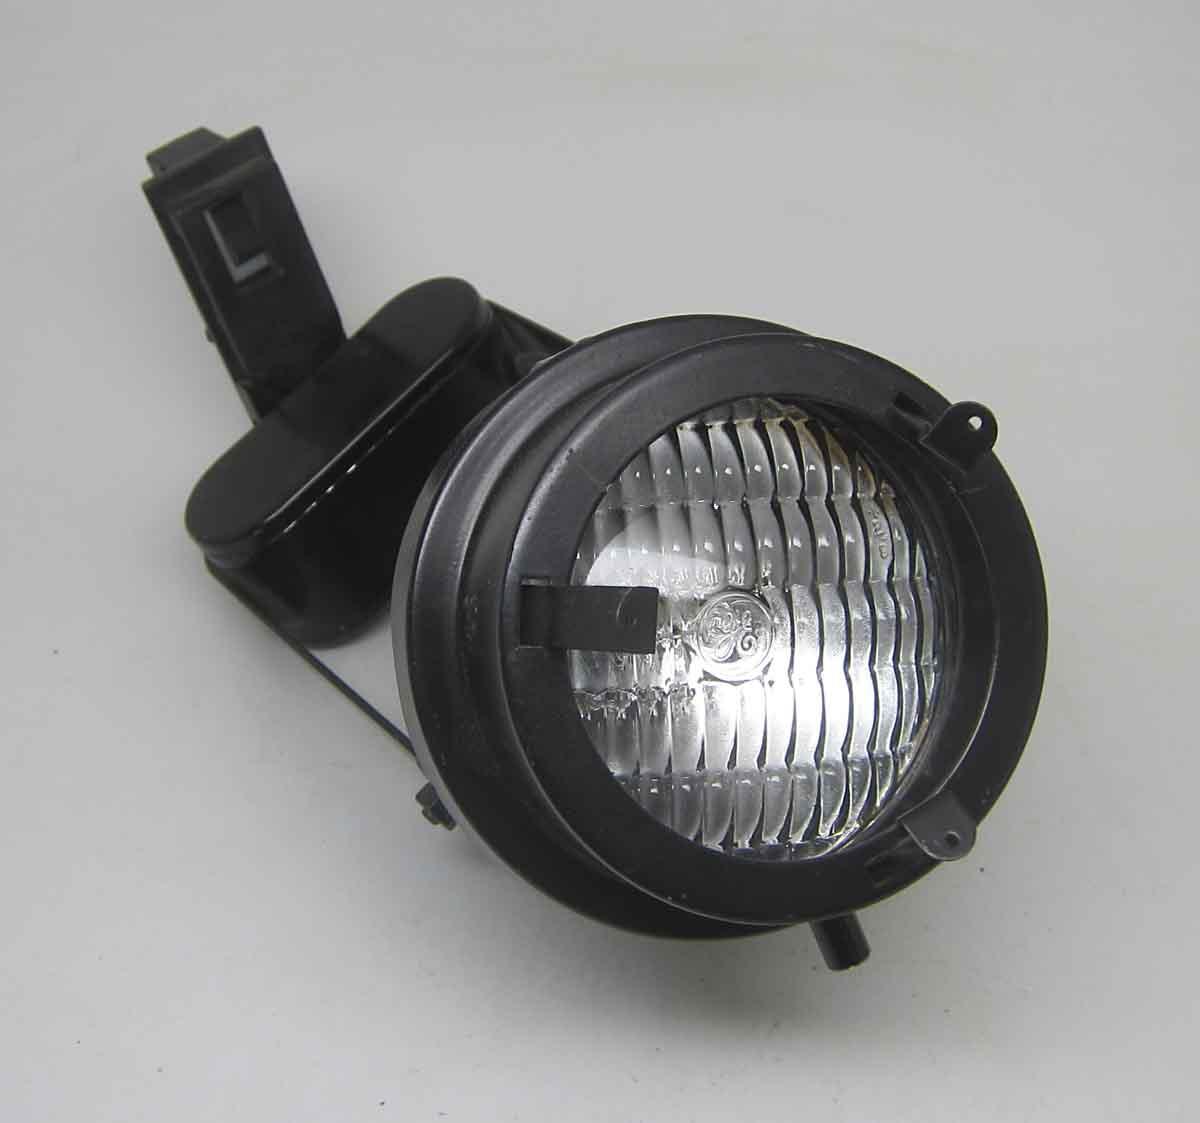 1980s General Electric Spot Light Fixture